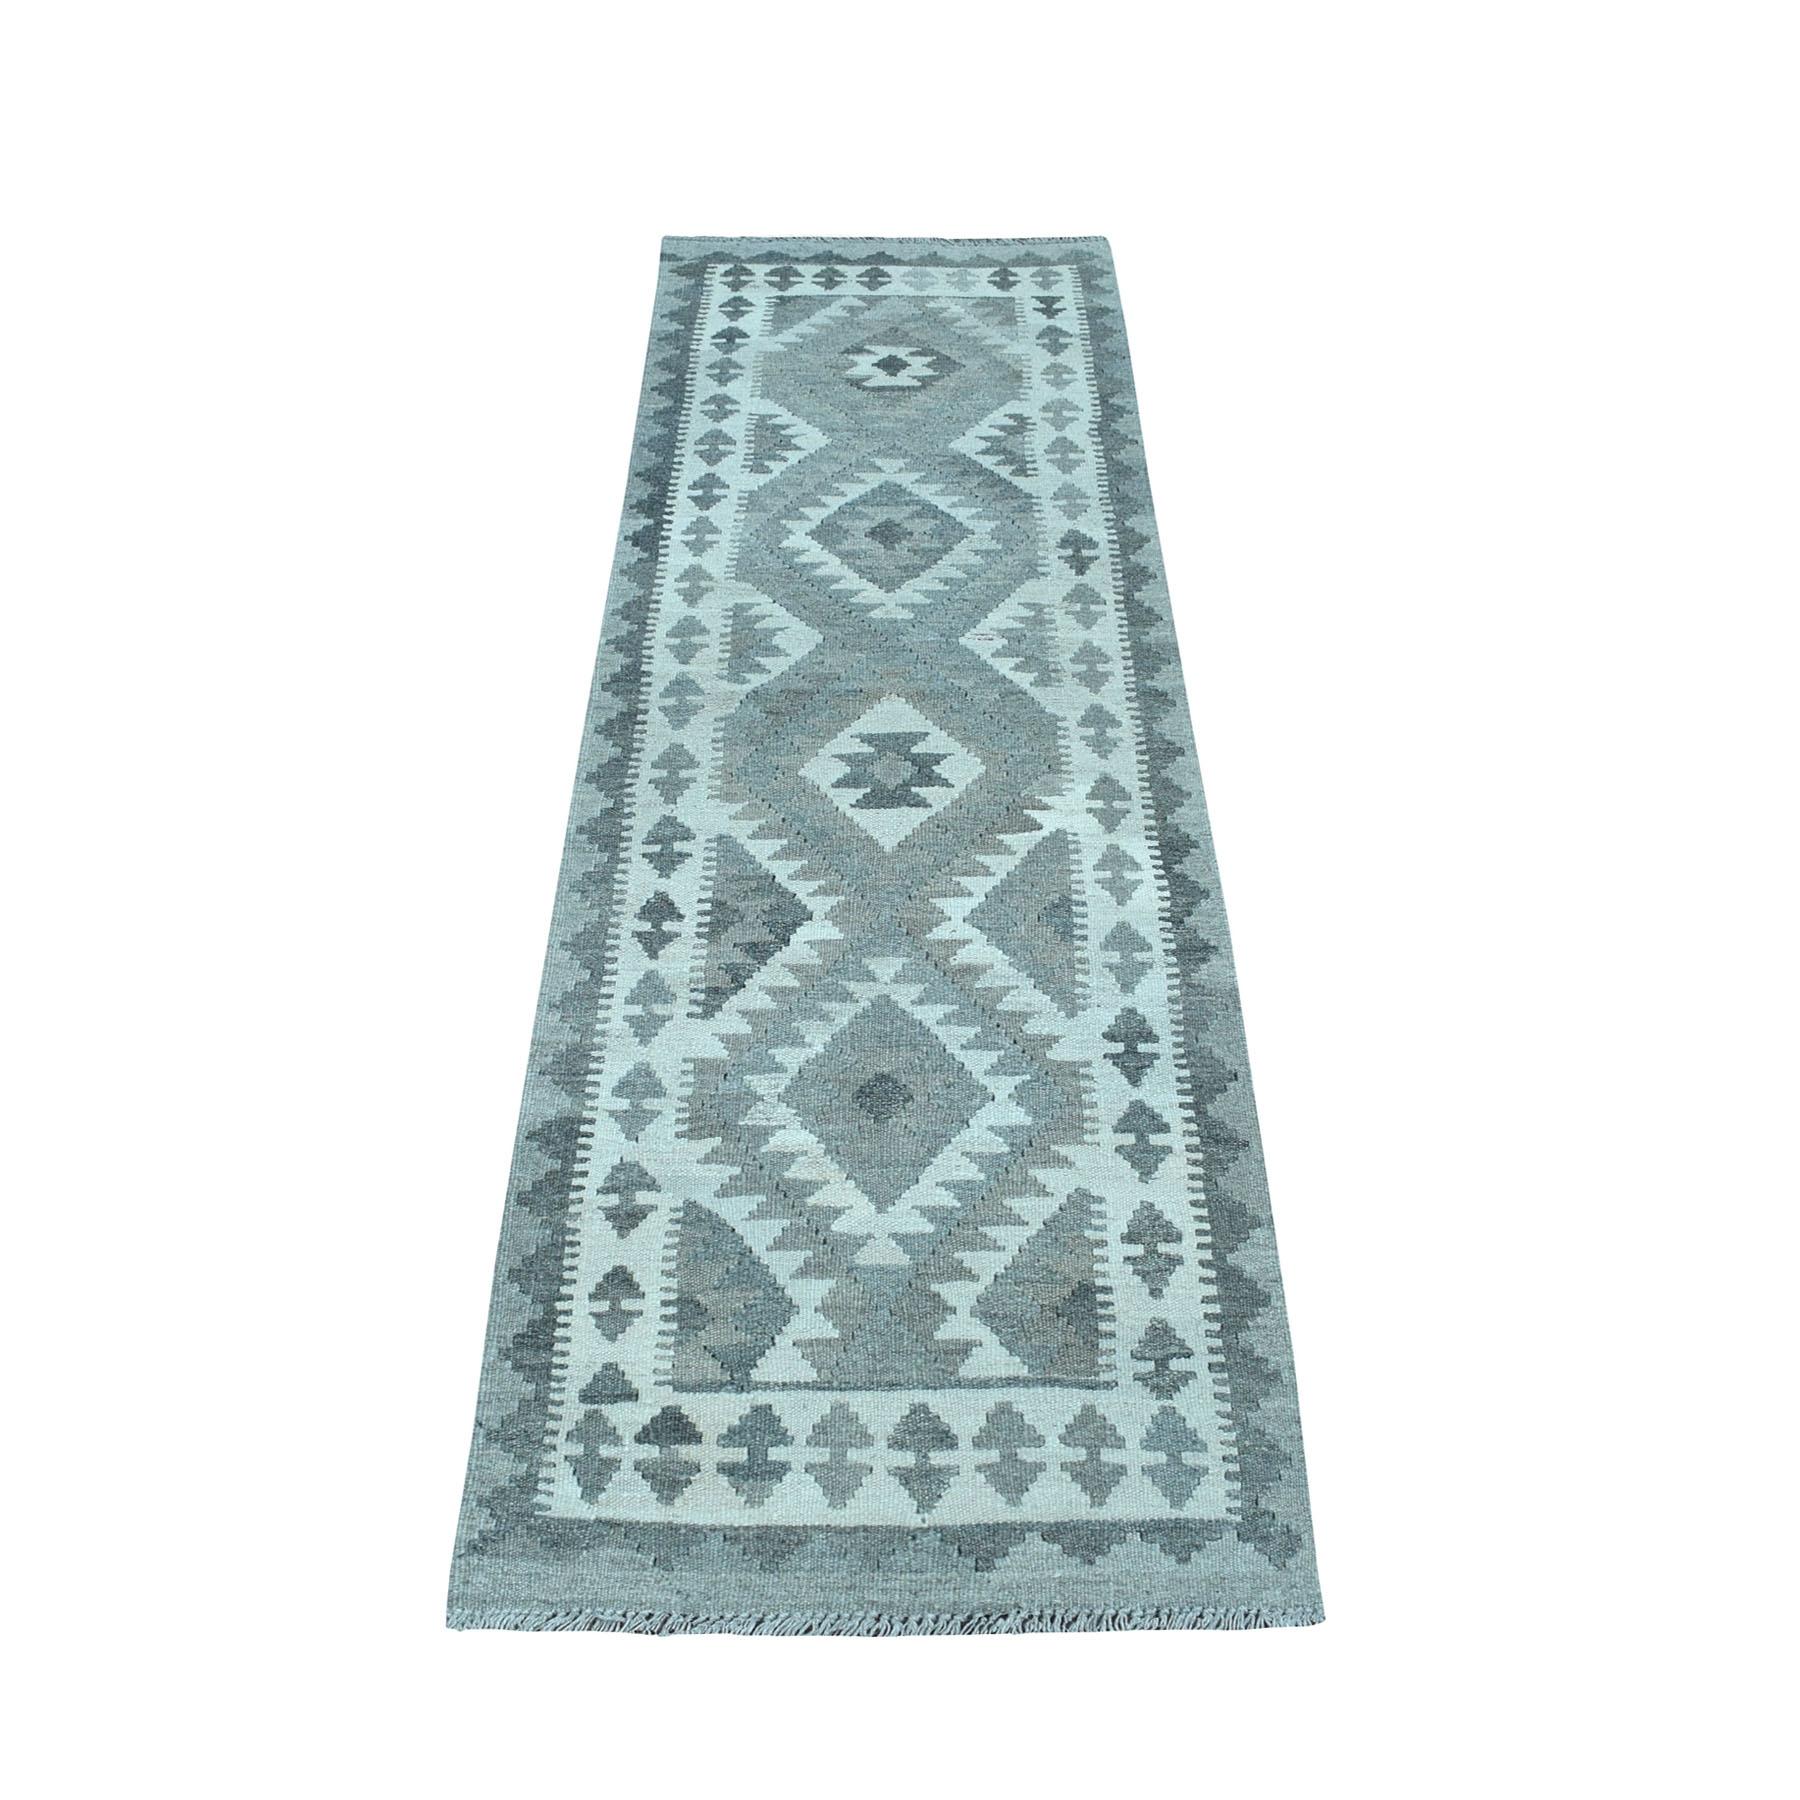 "2'x6'8"" Undyed Natural Wool Afghan Kilim Reversible Hand Woven Runner Oriental Rug 53049"